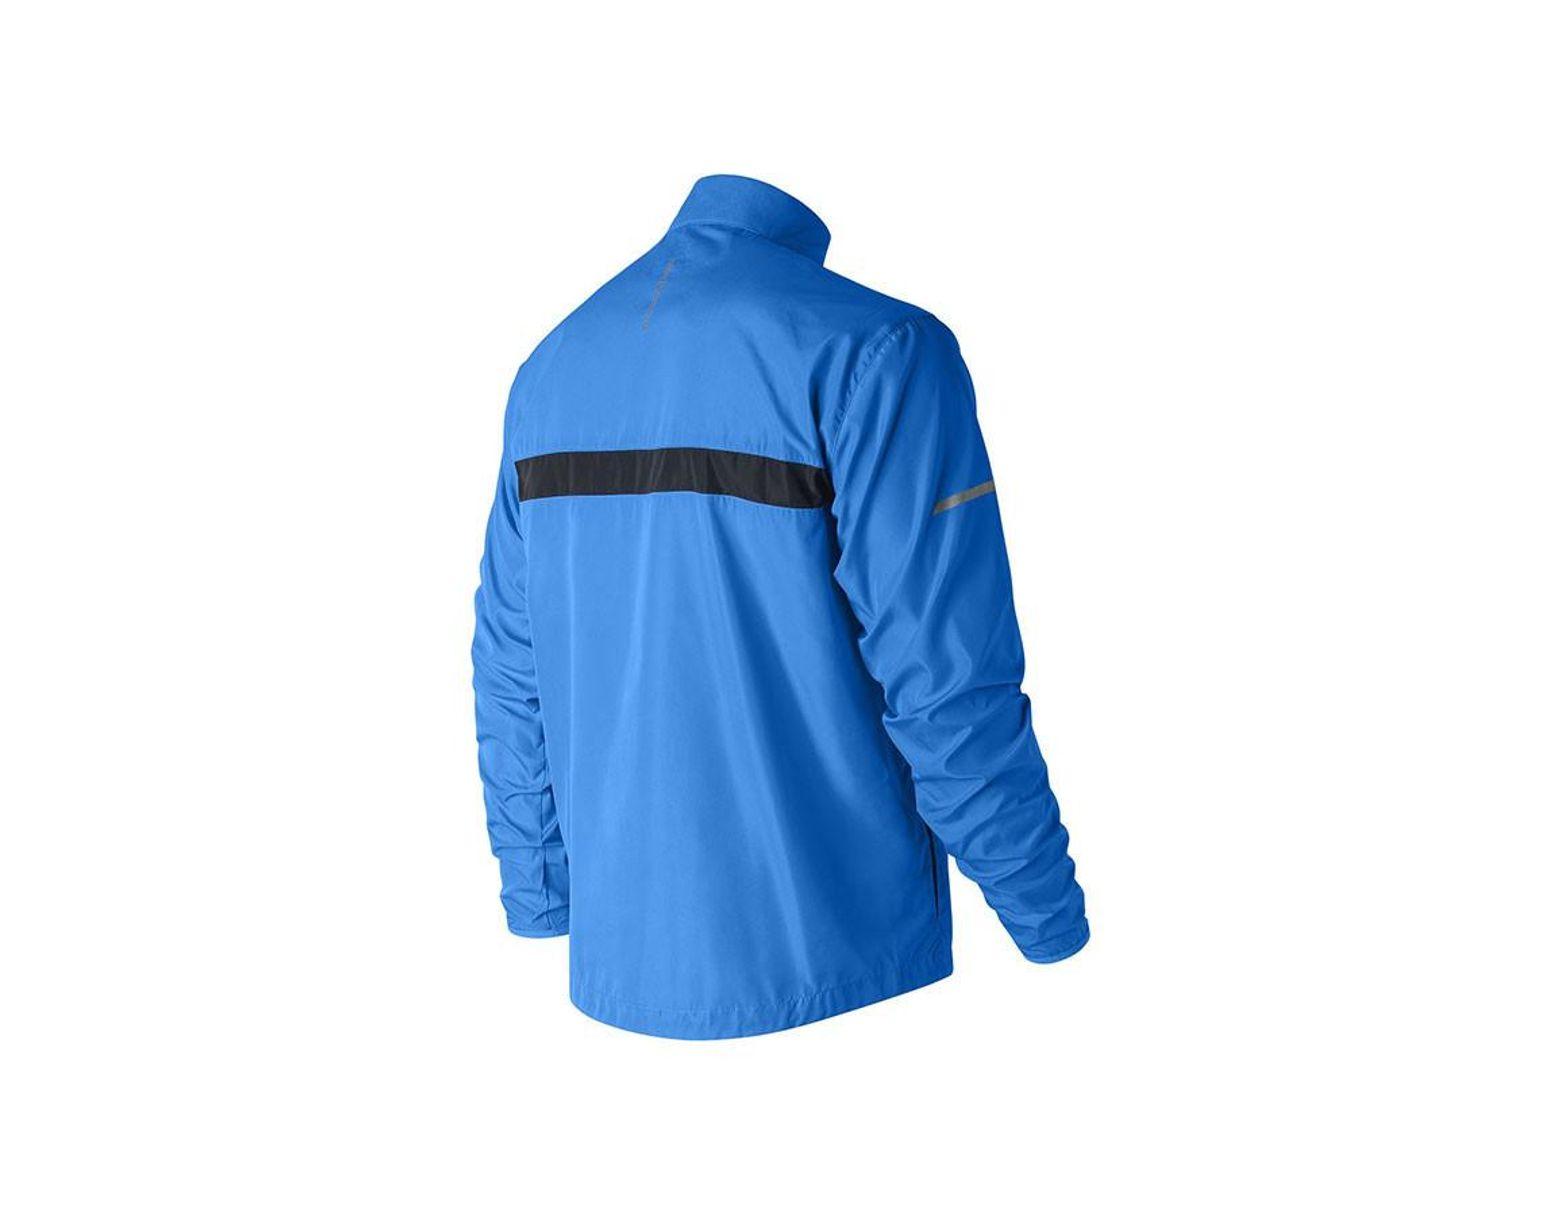 ca975d48b33ac New Balance Windcheater 2.0 Jacket in Blue for Men - Lyst